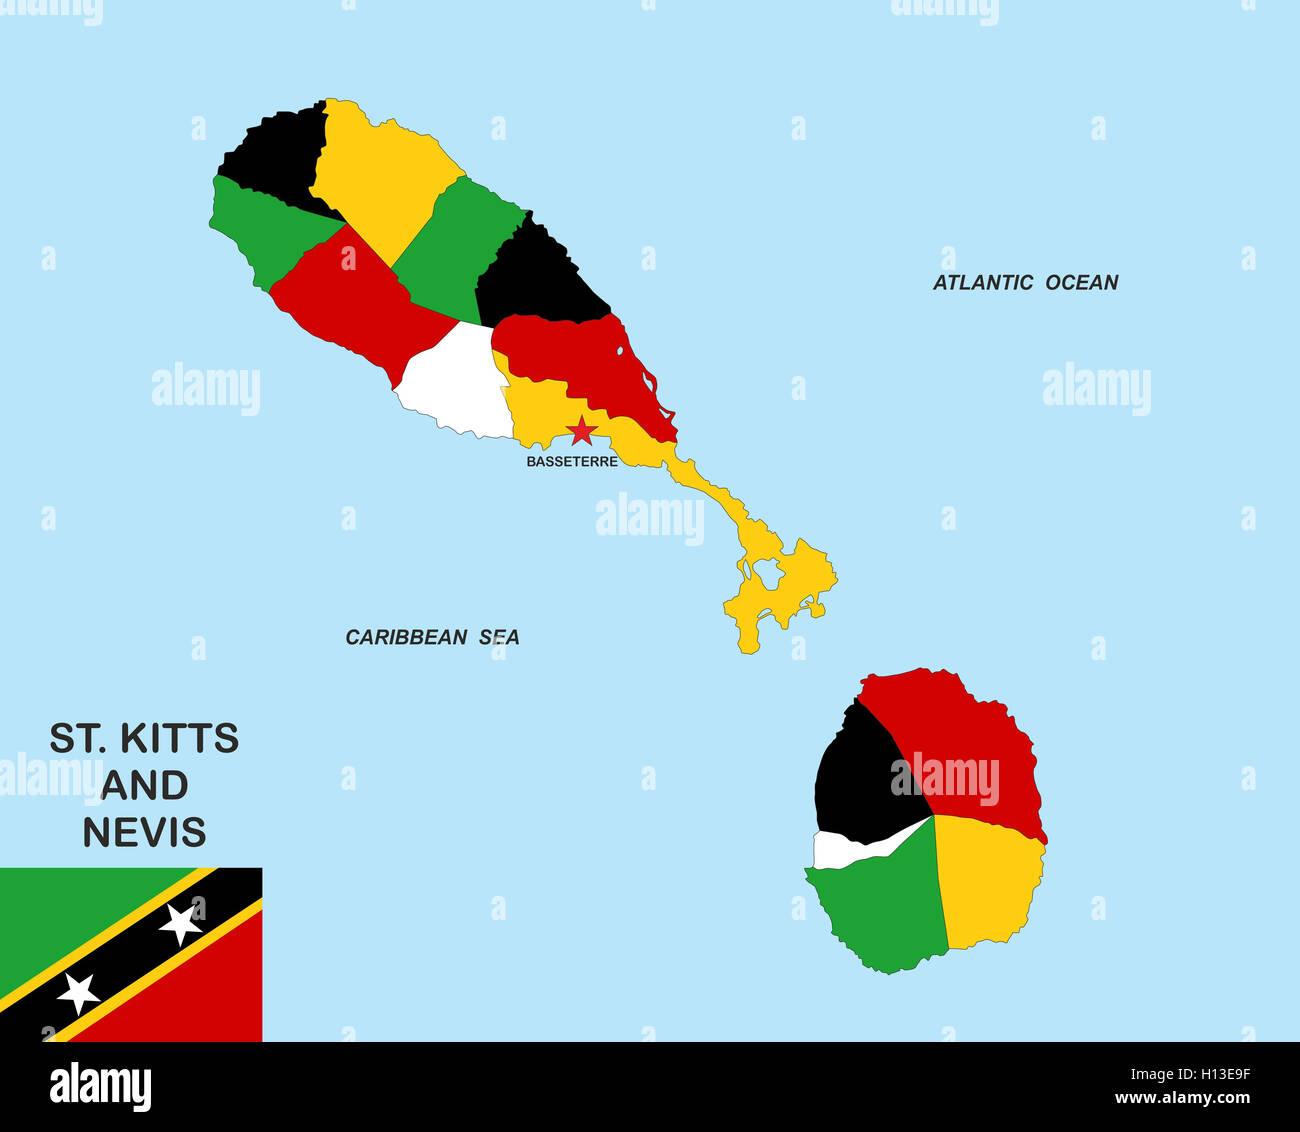 saint kitts and nevis map Stock Photo: 121164331 - Alamy